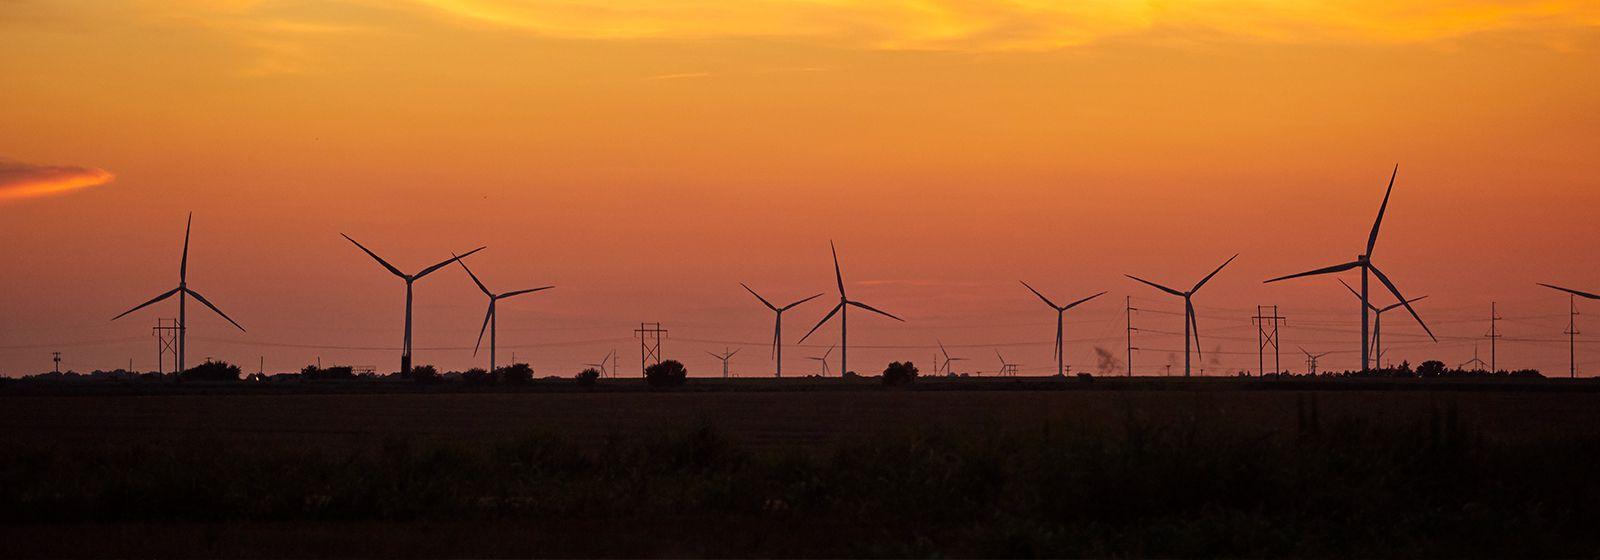 Wind turbines in Oklahoma energize economy